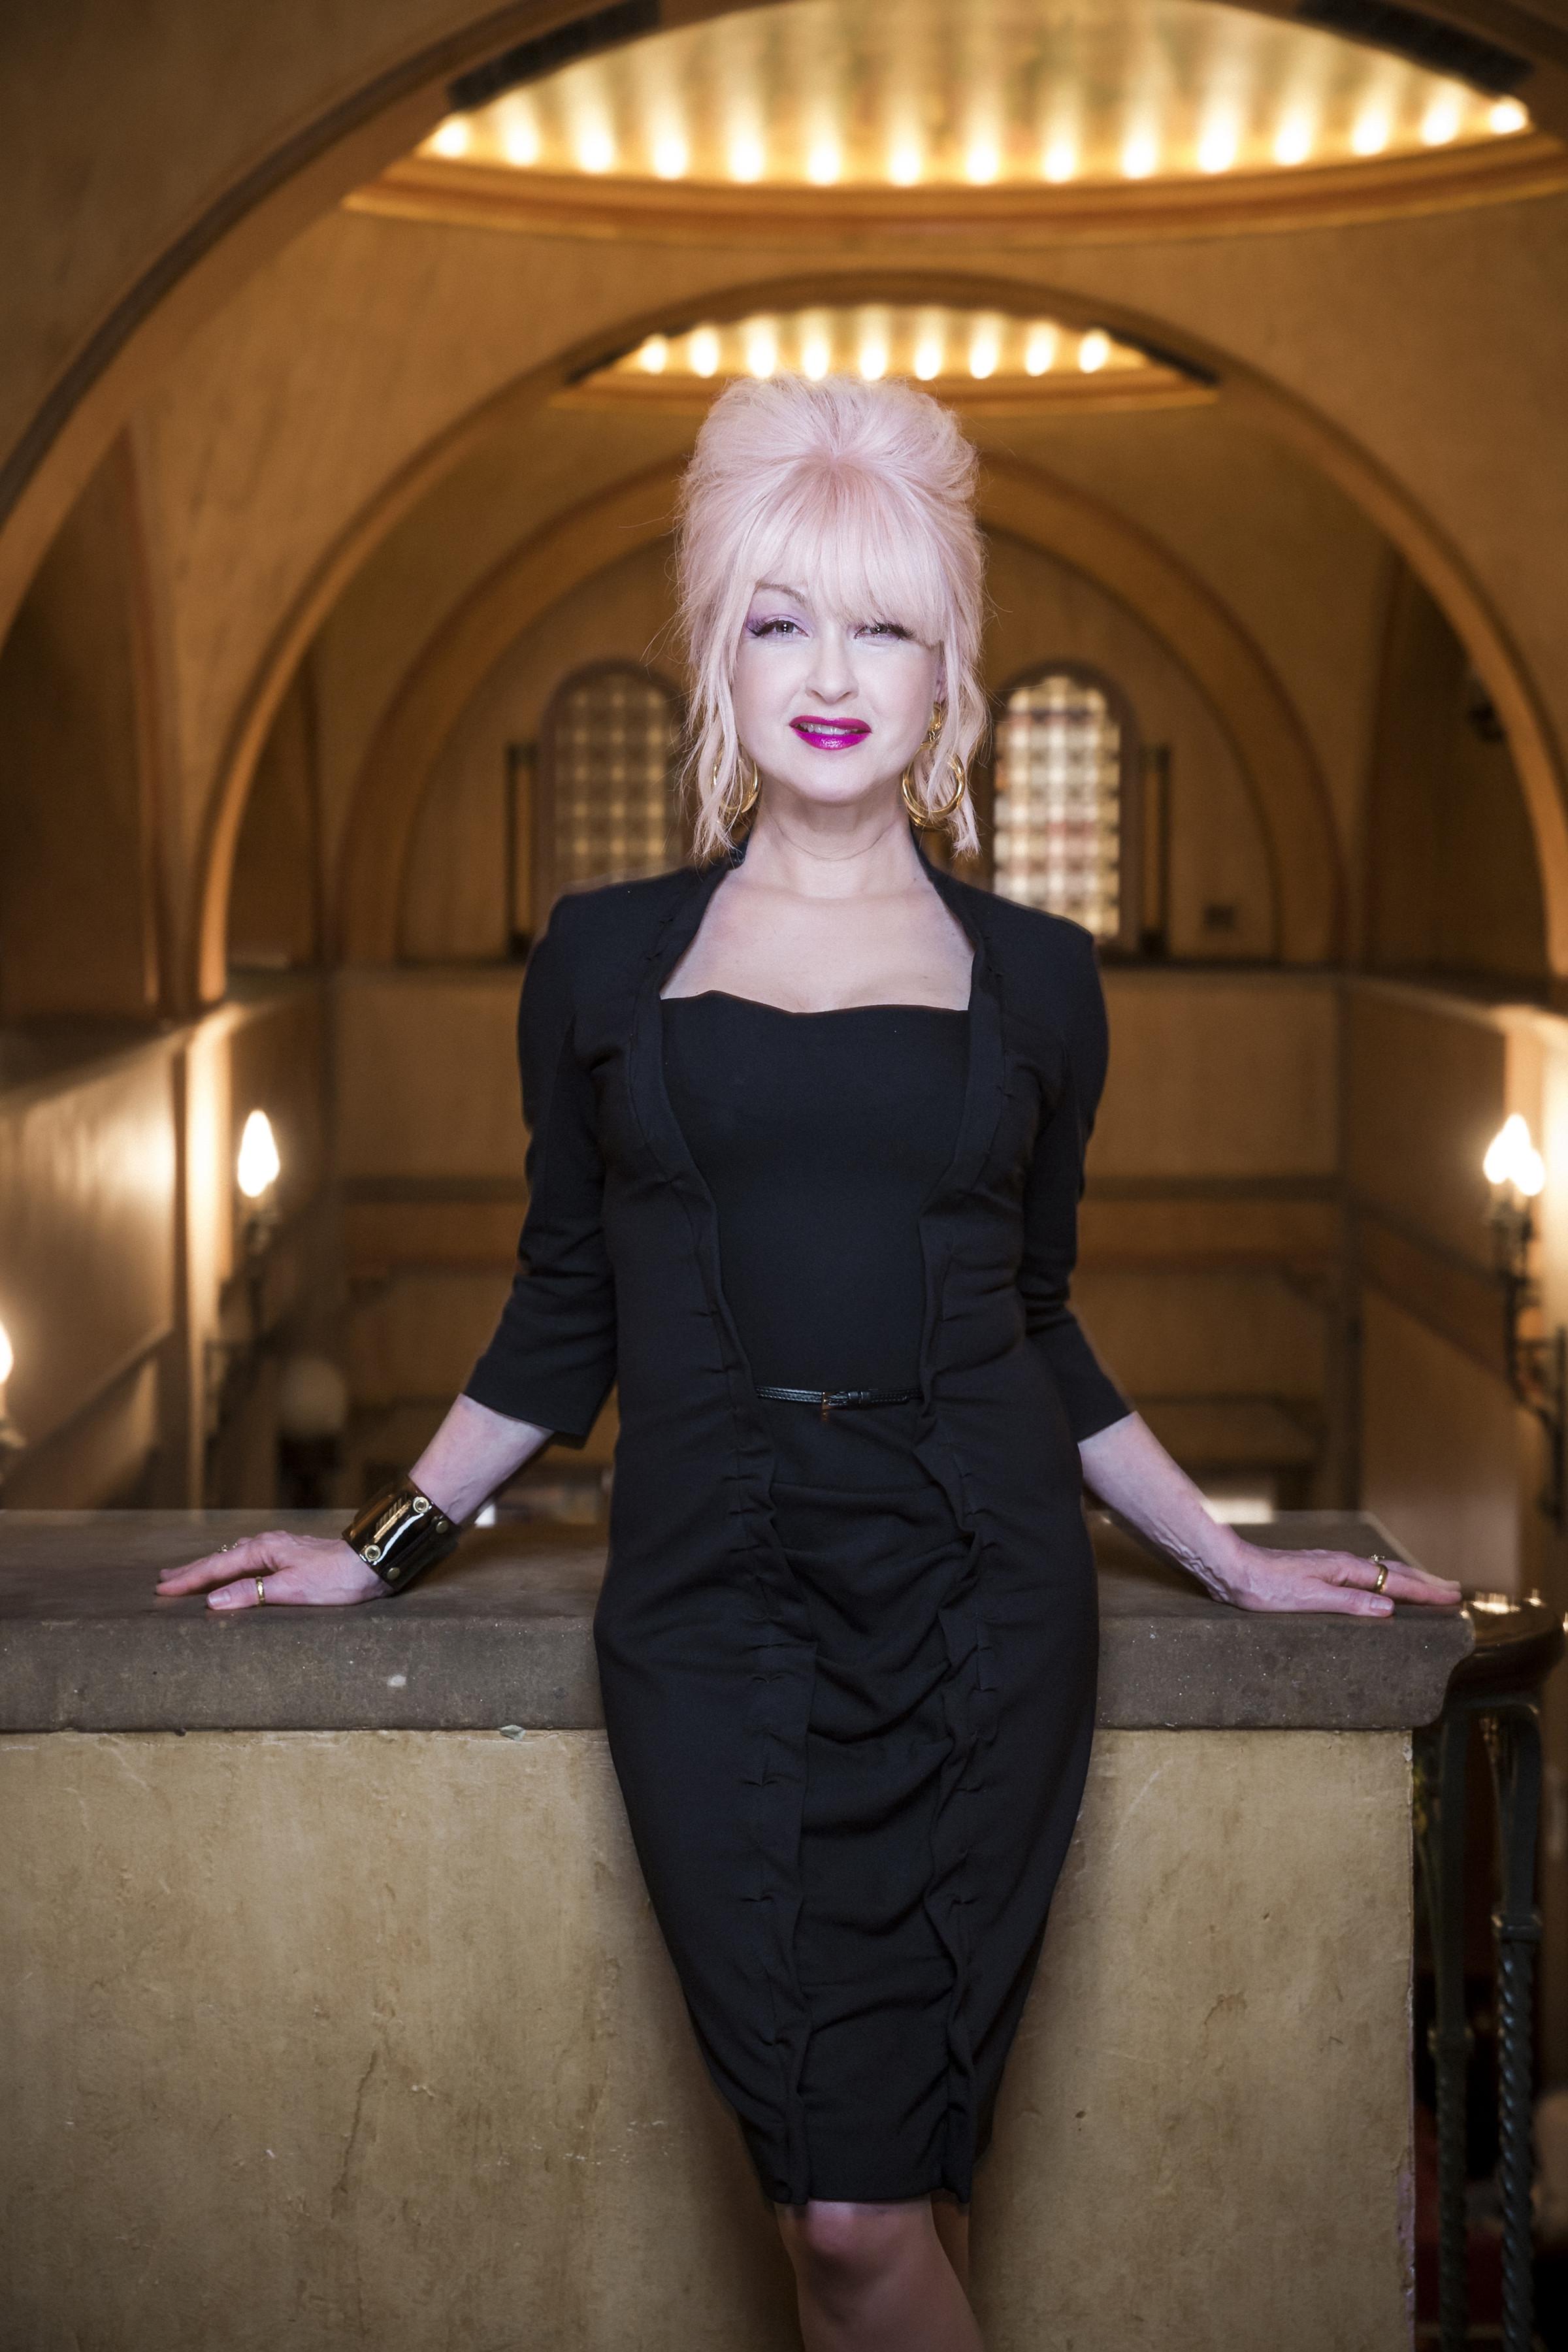 cyndi lauper - Dolly Parton Hard Candy Christmas